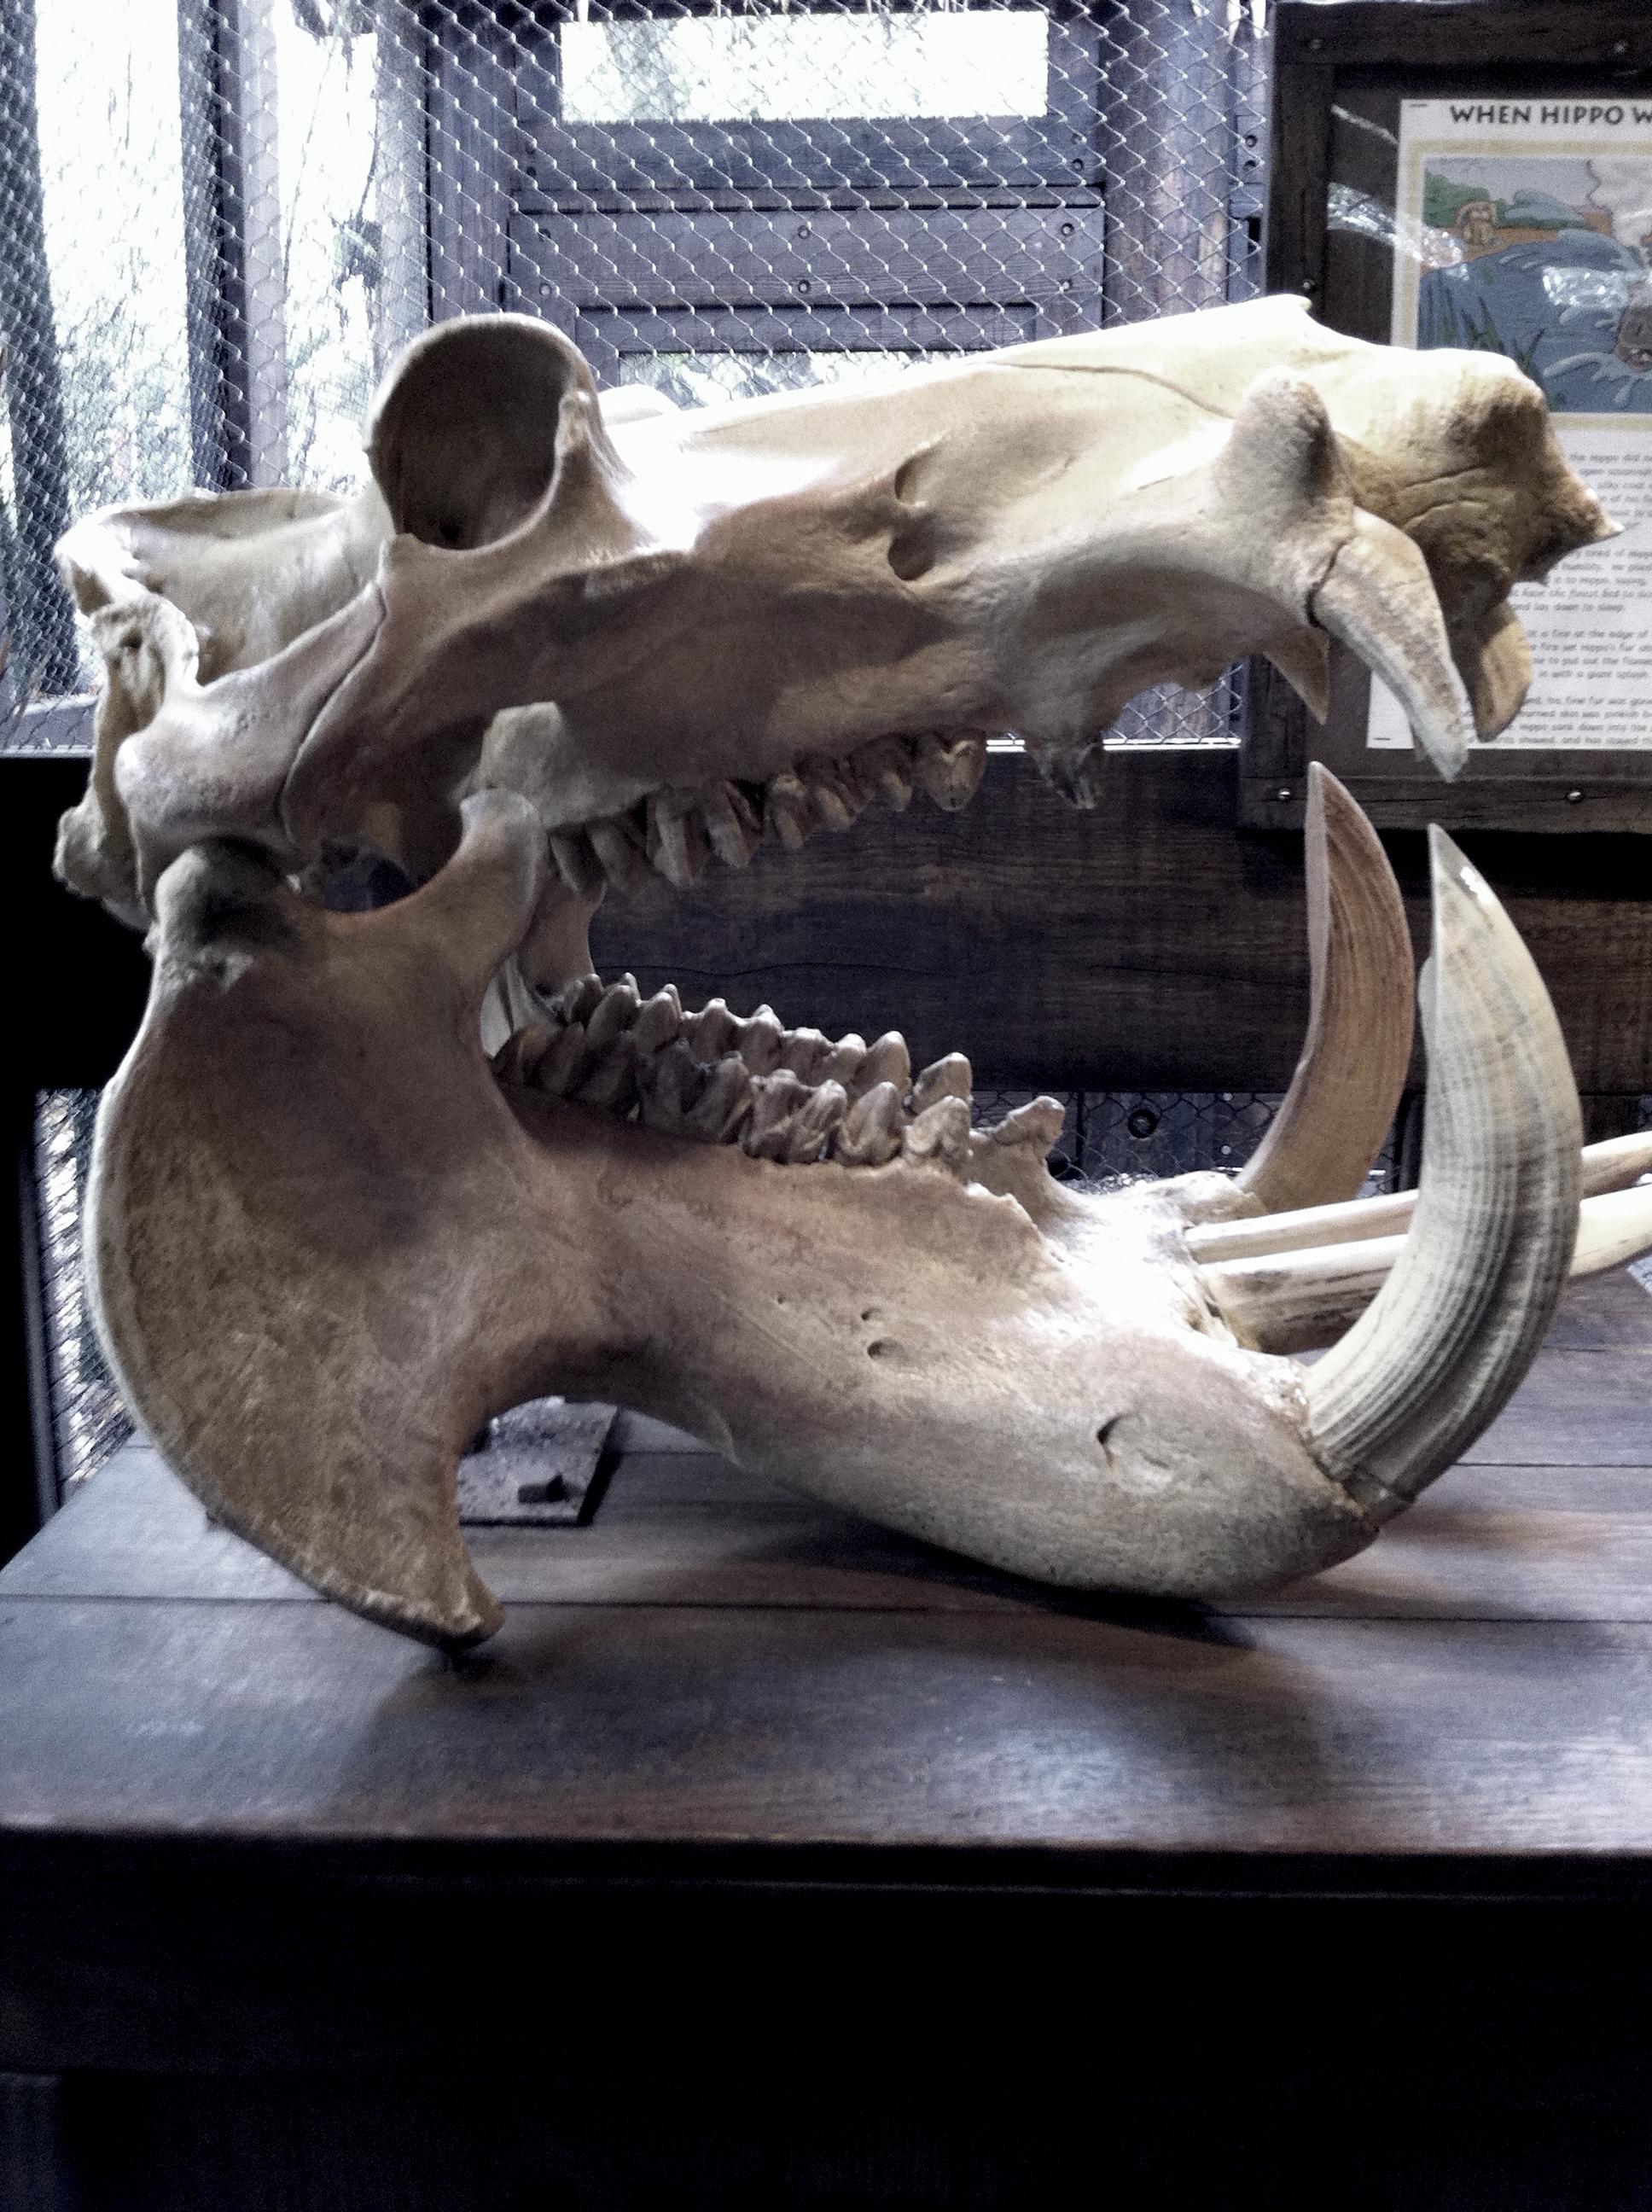 Crâne d'hippopotame